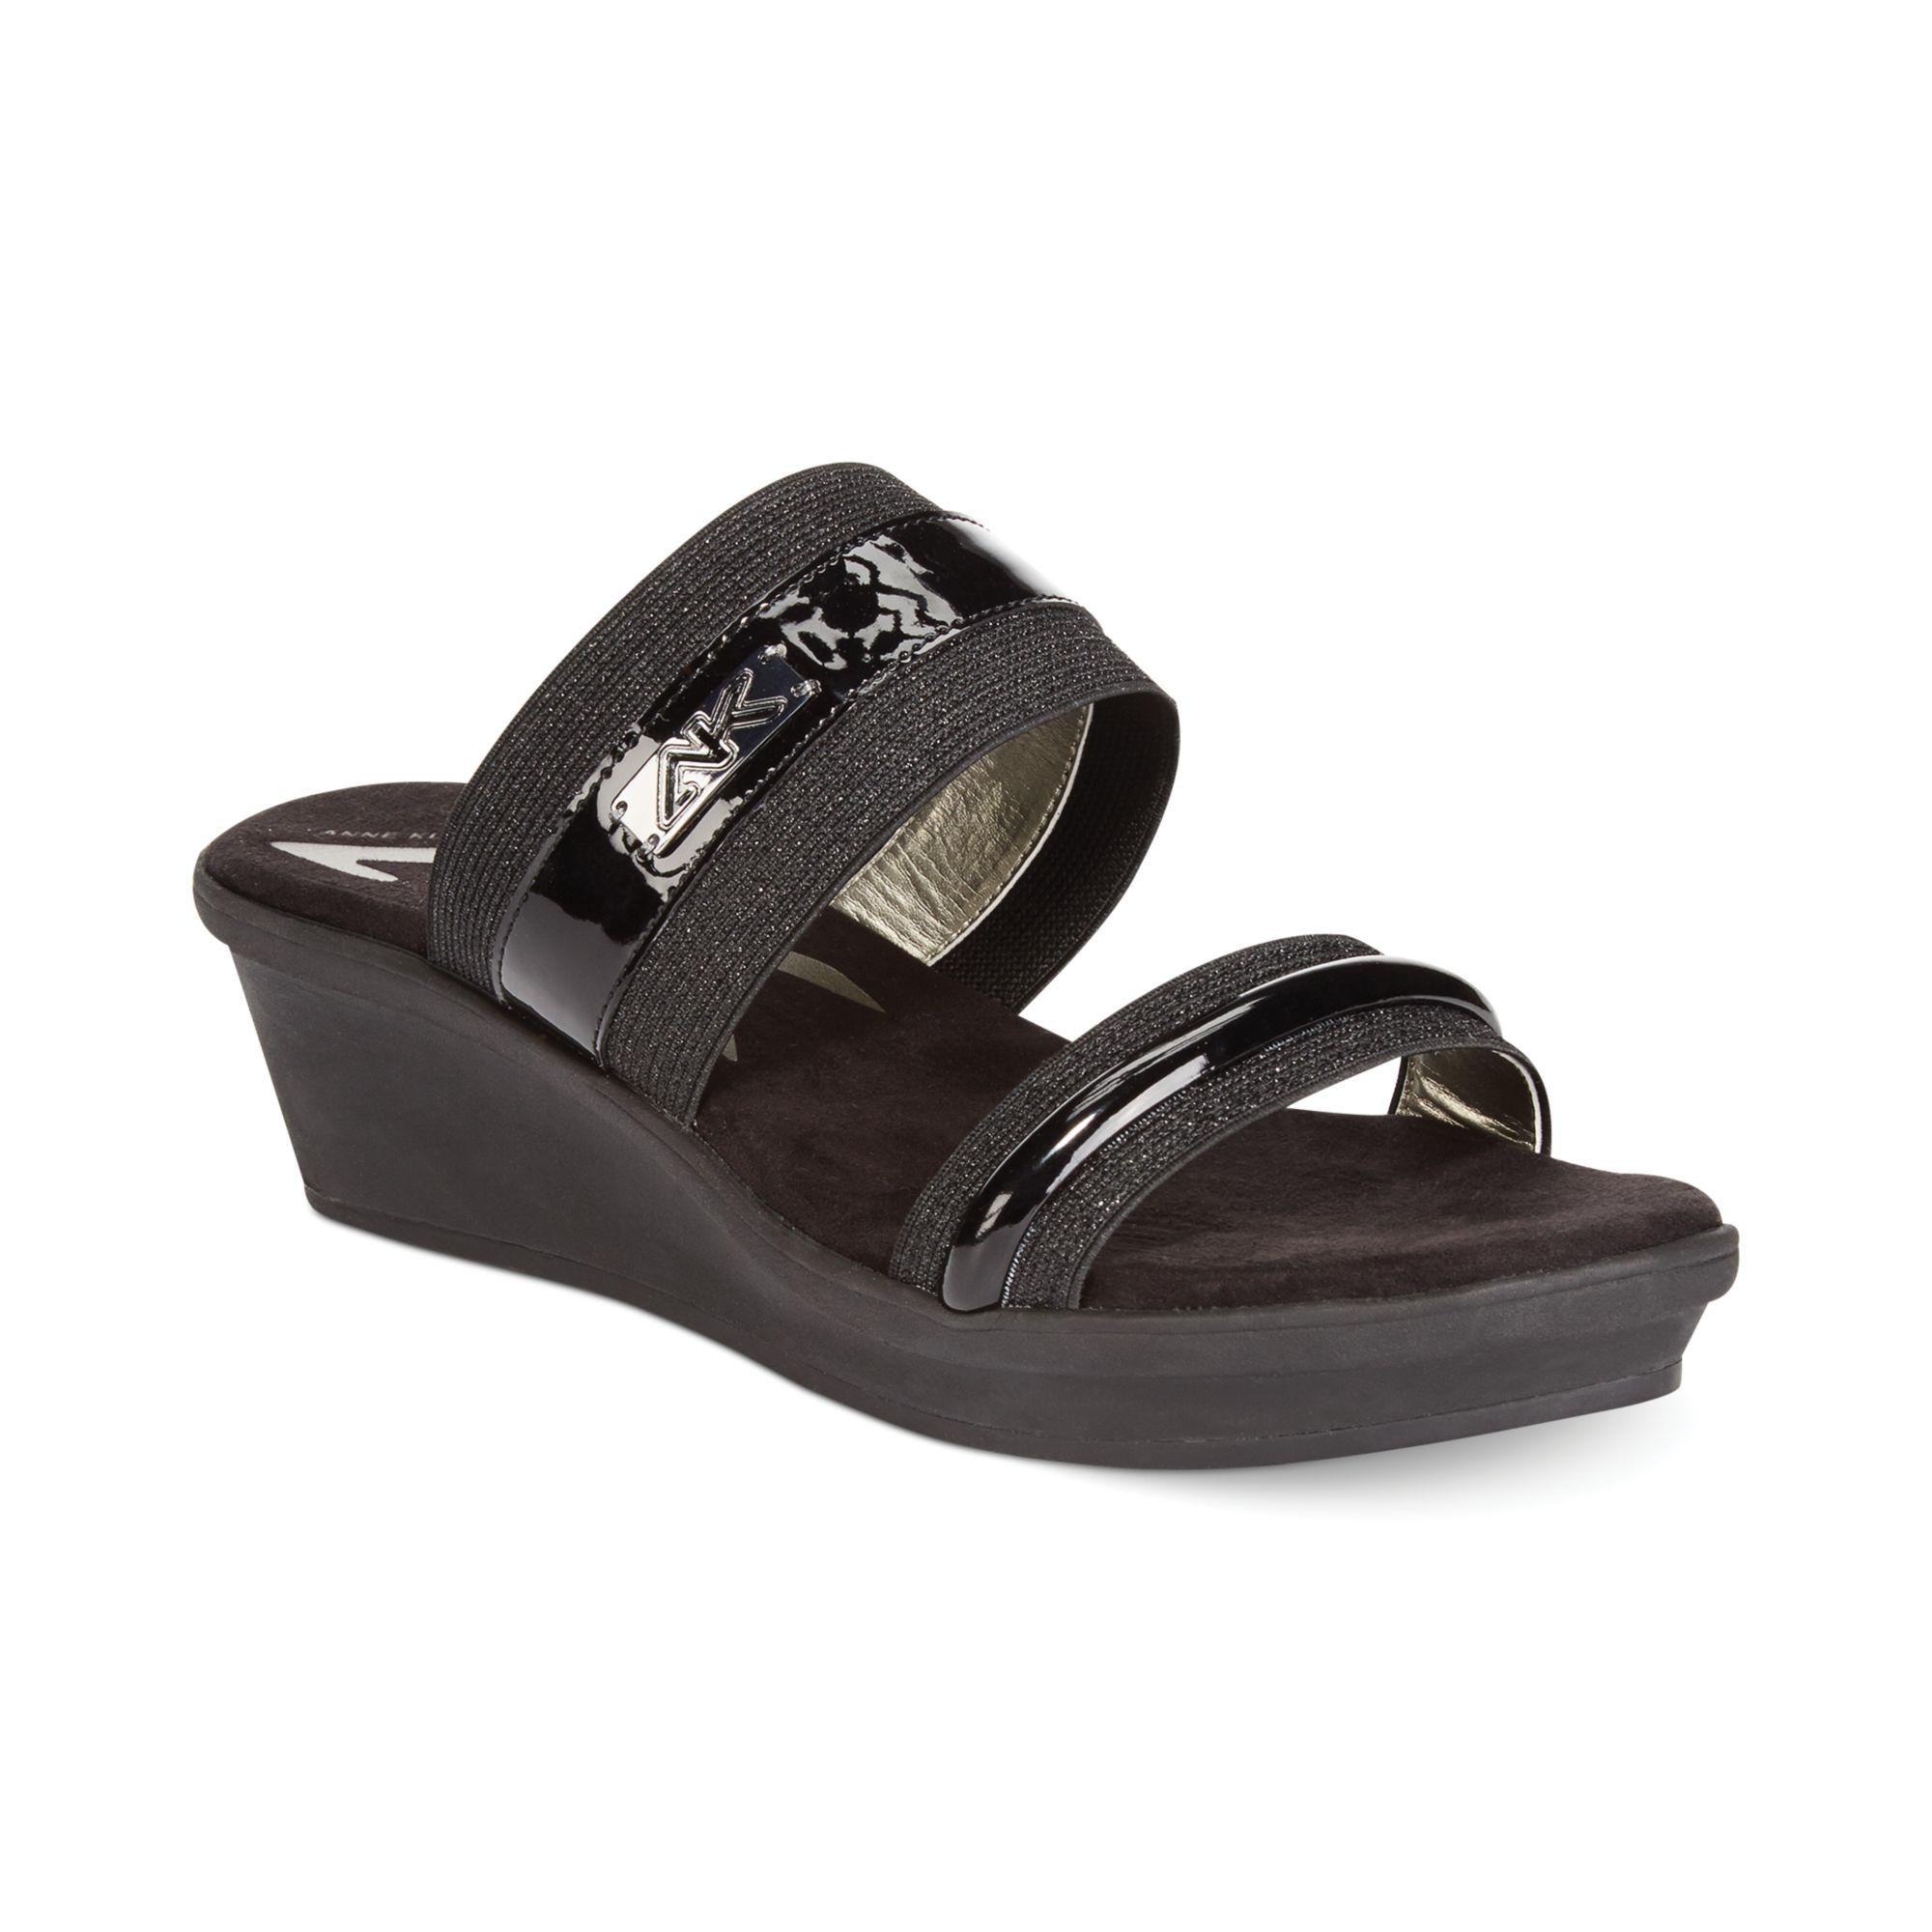 90d5863b7ab9 Anne Klein Ewan Platform Wedge Sandals in Black (BlackBlack Fabric)